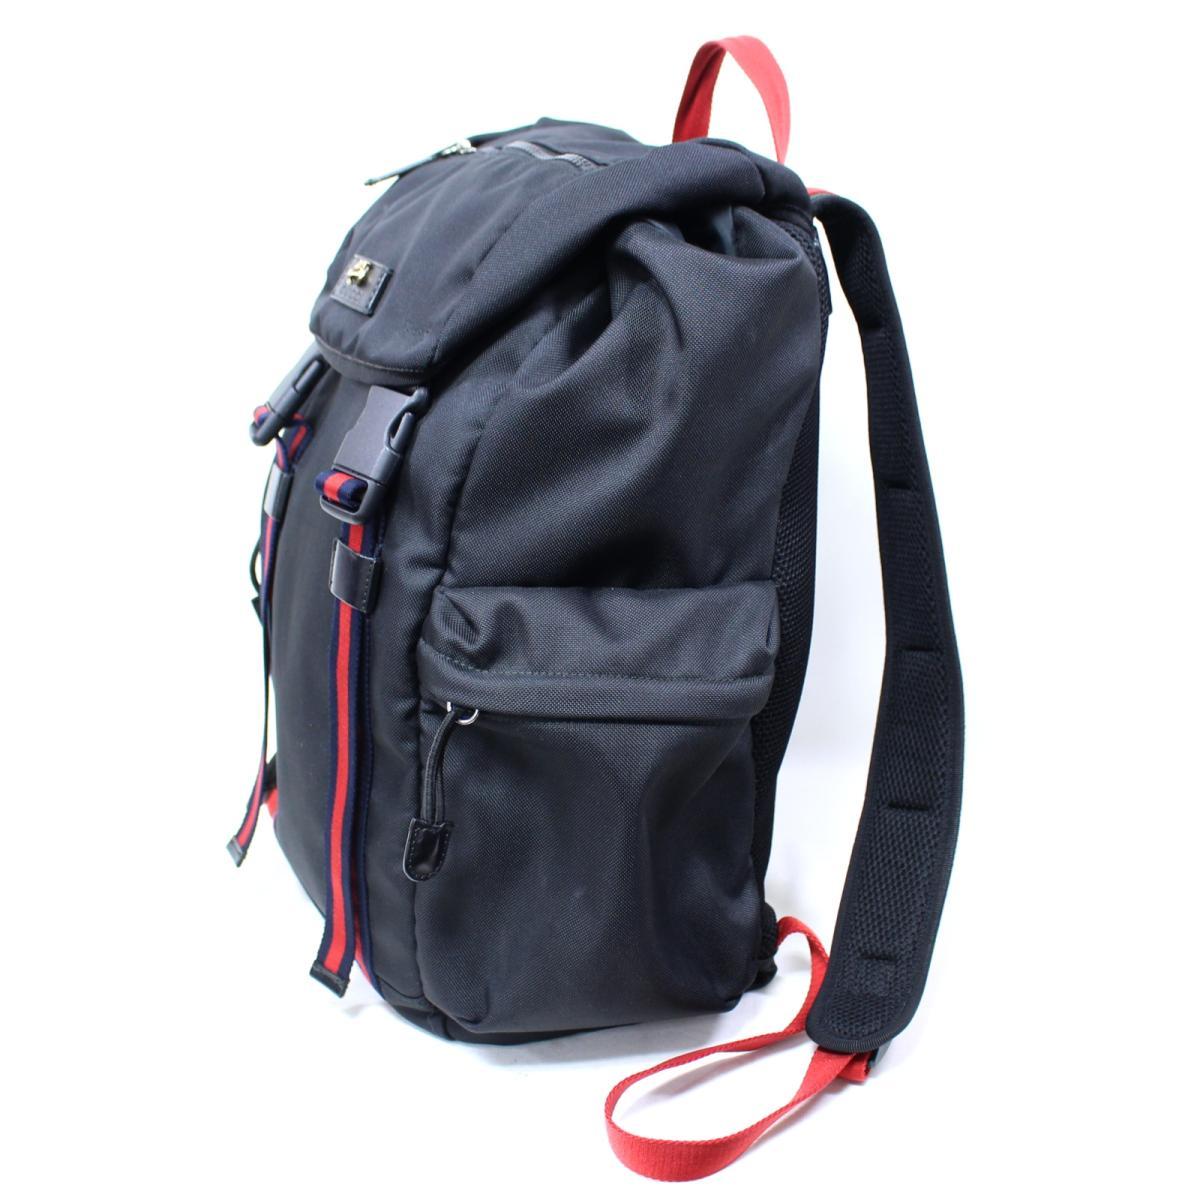 Gucci anima Rie tiger bag pack rucksack bag unisex techno canvas black X  red X Ney bi- (429037) 92169615d3c95